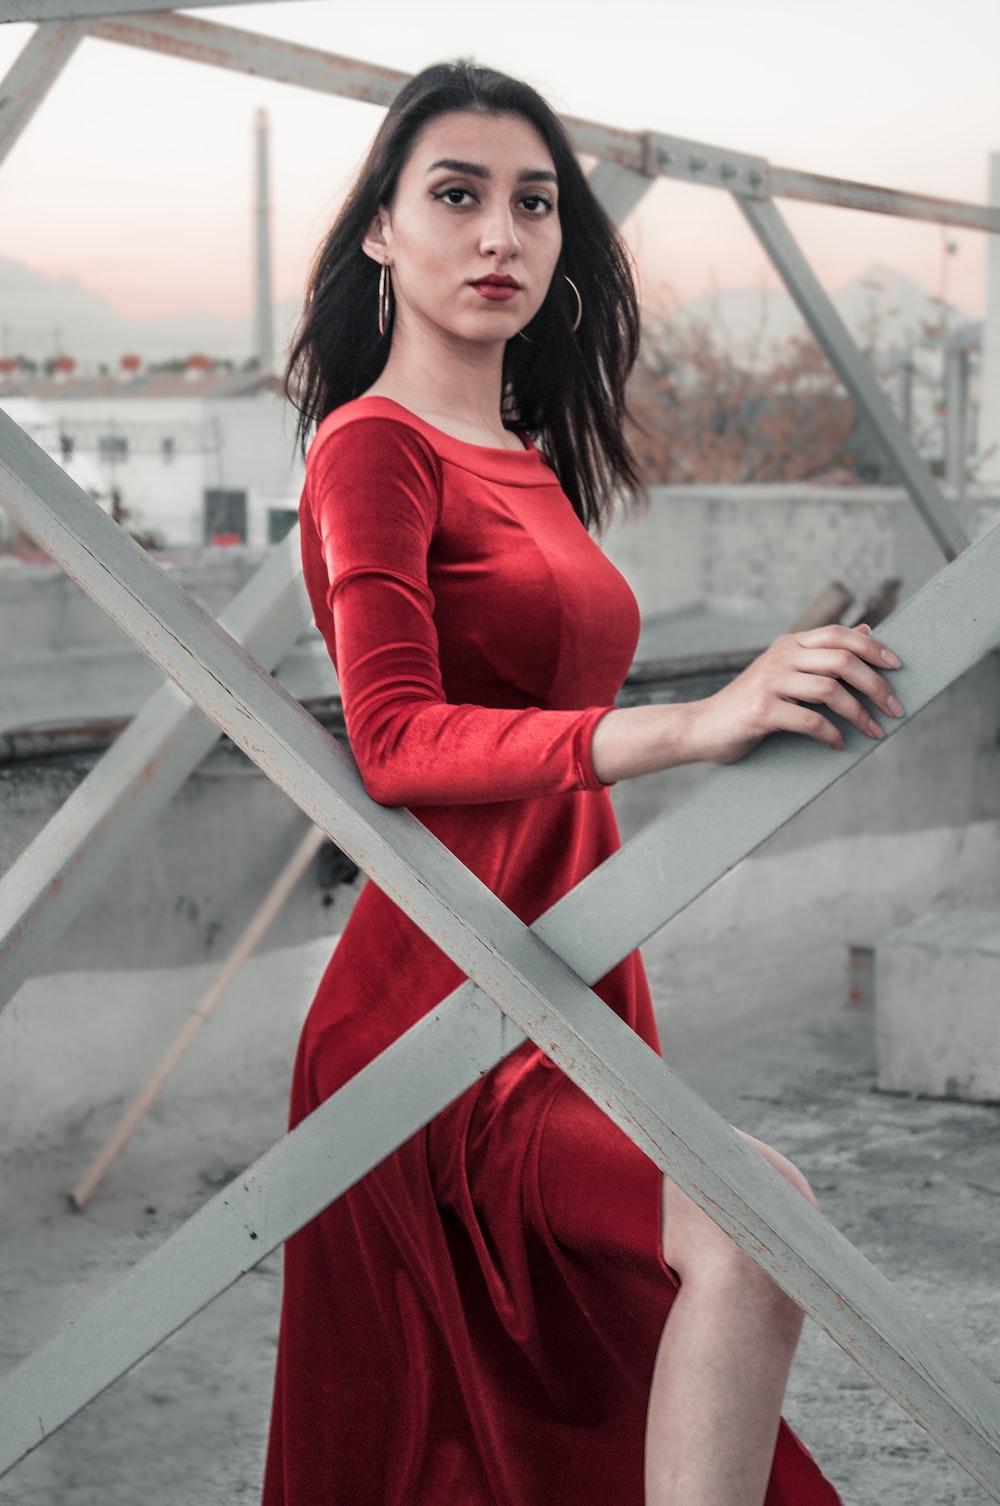 woman standing near metal fence